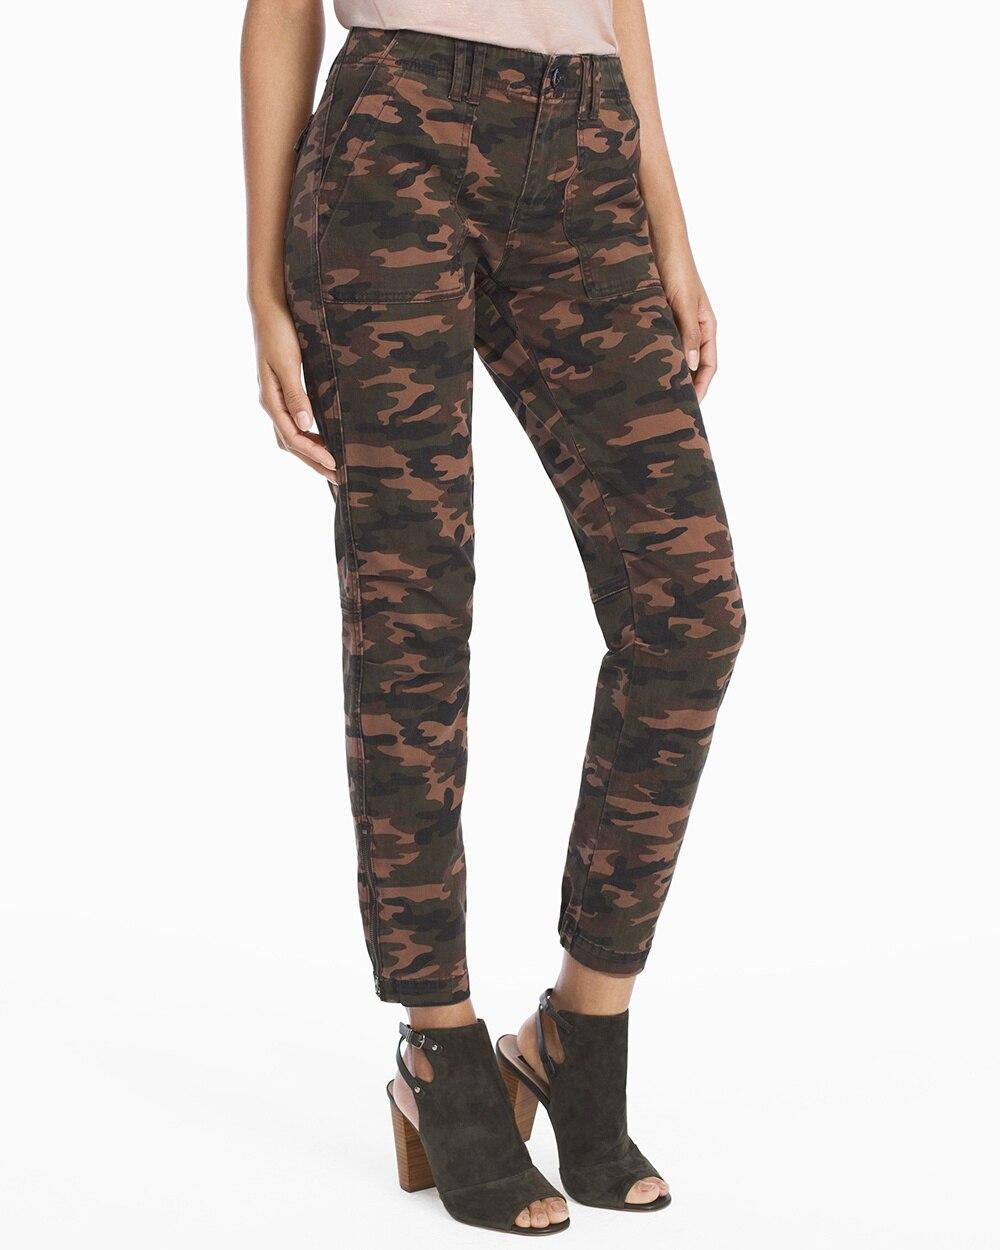 82c6ac50b8e Utility Slim Camo Jeans - White House Black Market